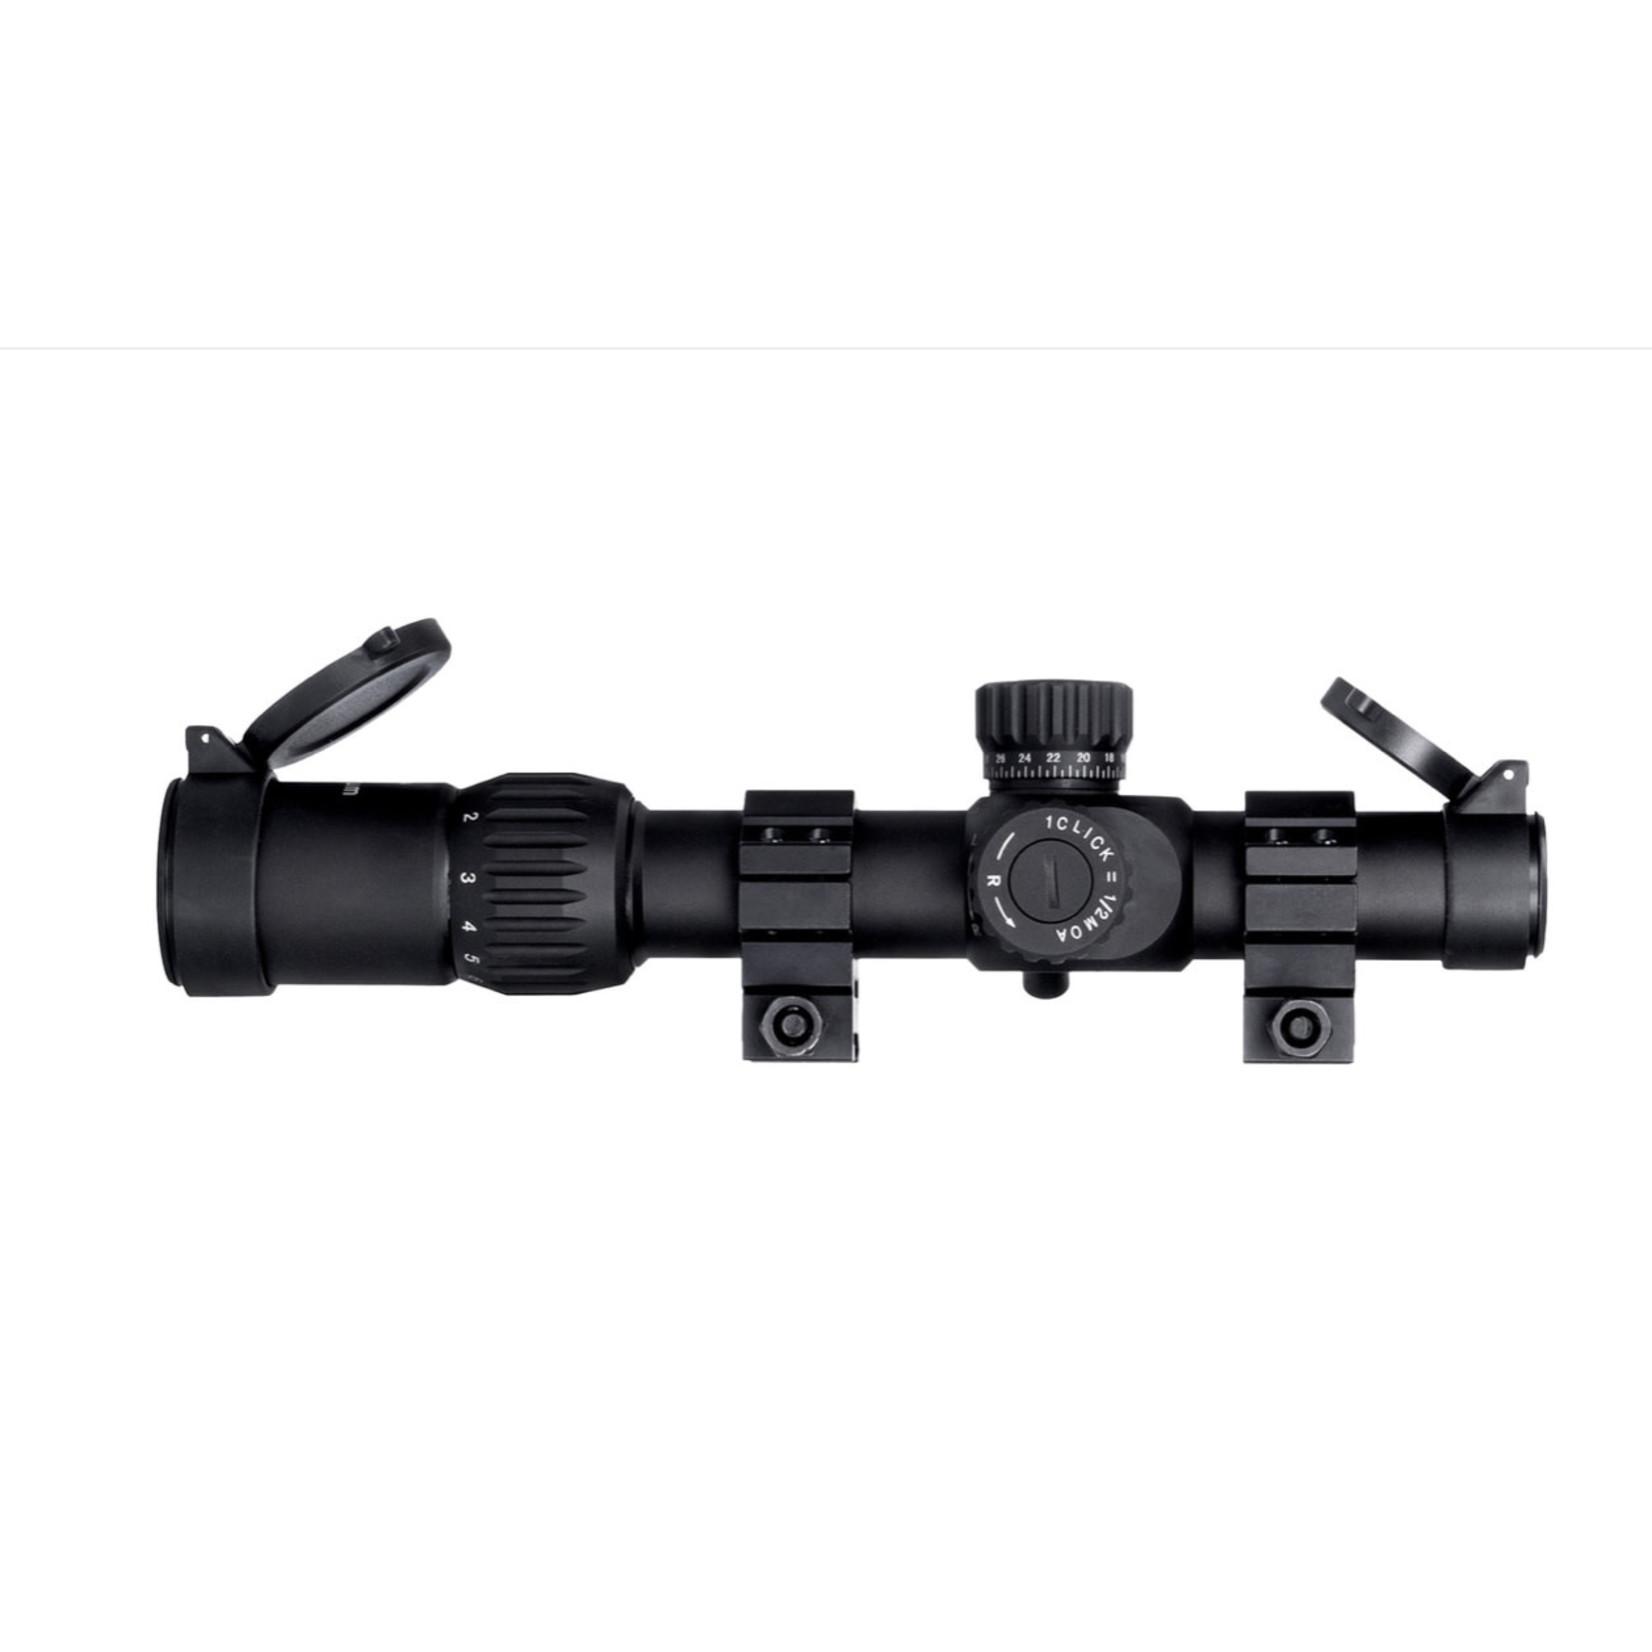 Monstrum Tactical Monstrum G3 1-6x24 FFP Rifle Scope (Black)